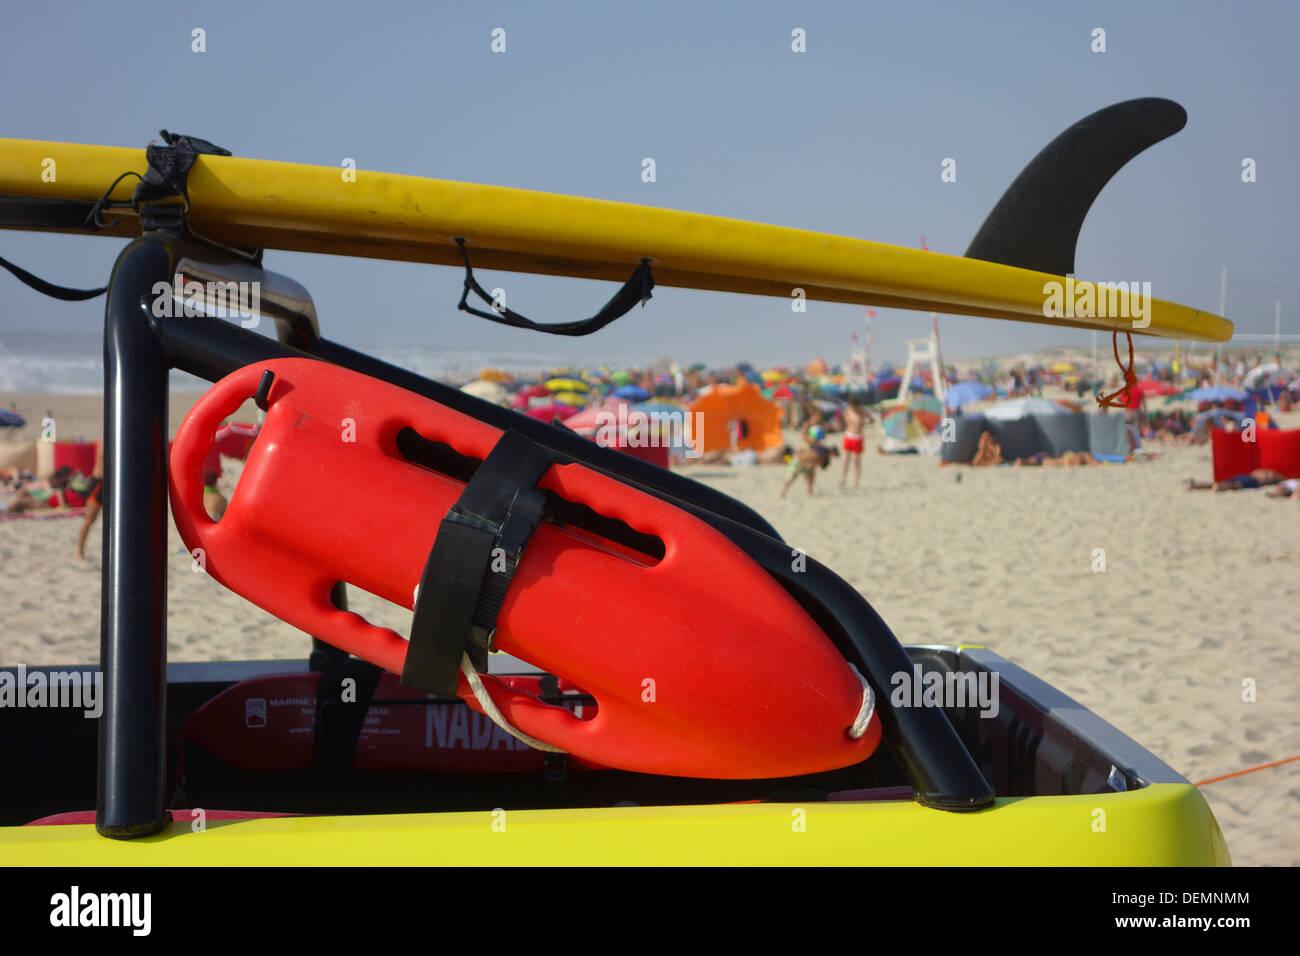 Lifeguard buoy - Stock Image